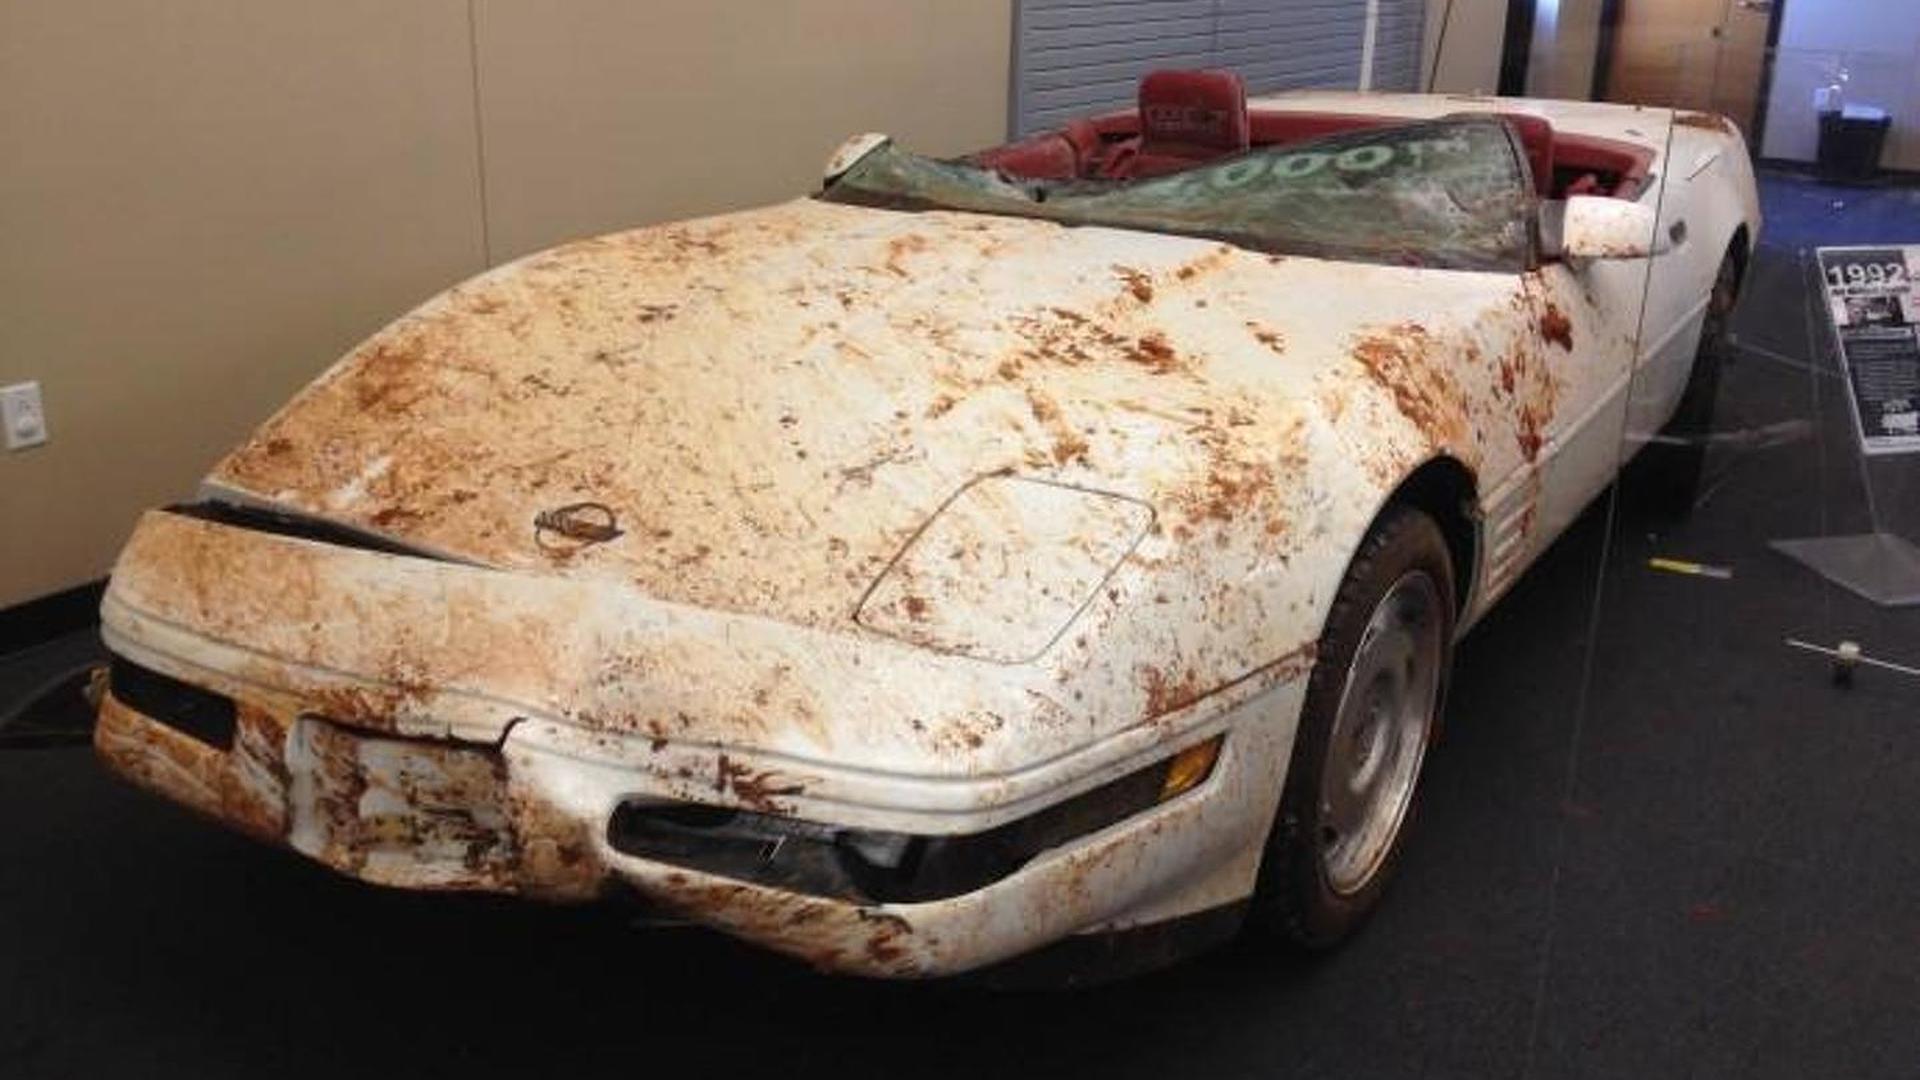 National Corvette Museum retrieved first three damaged Corvettes